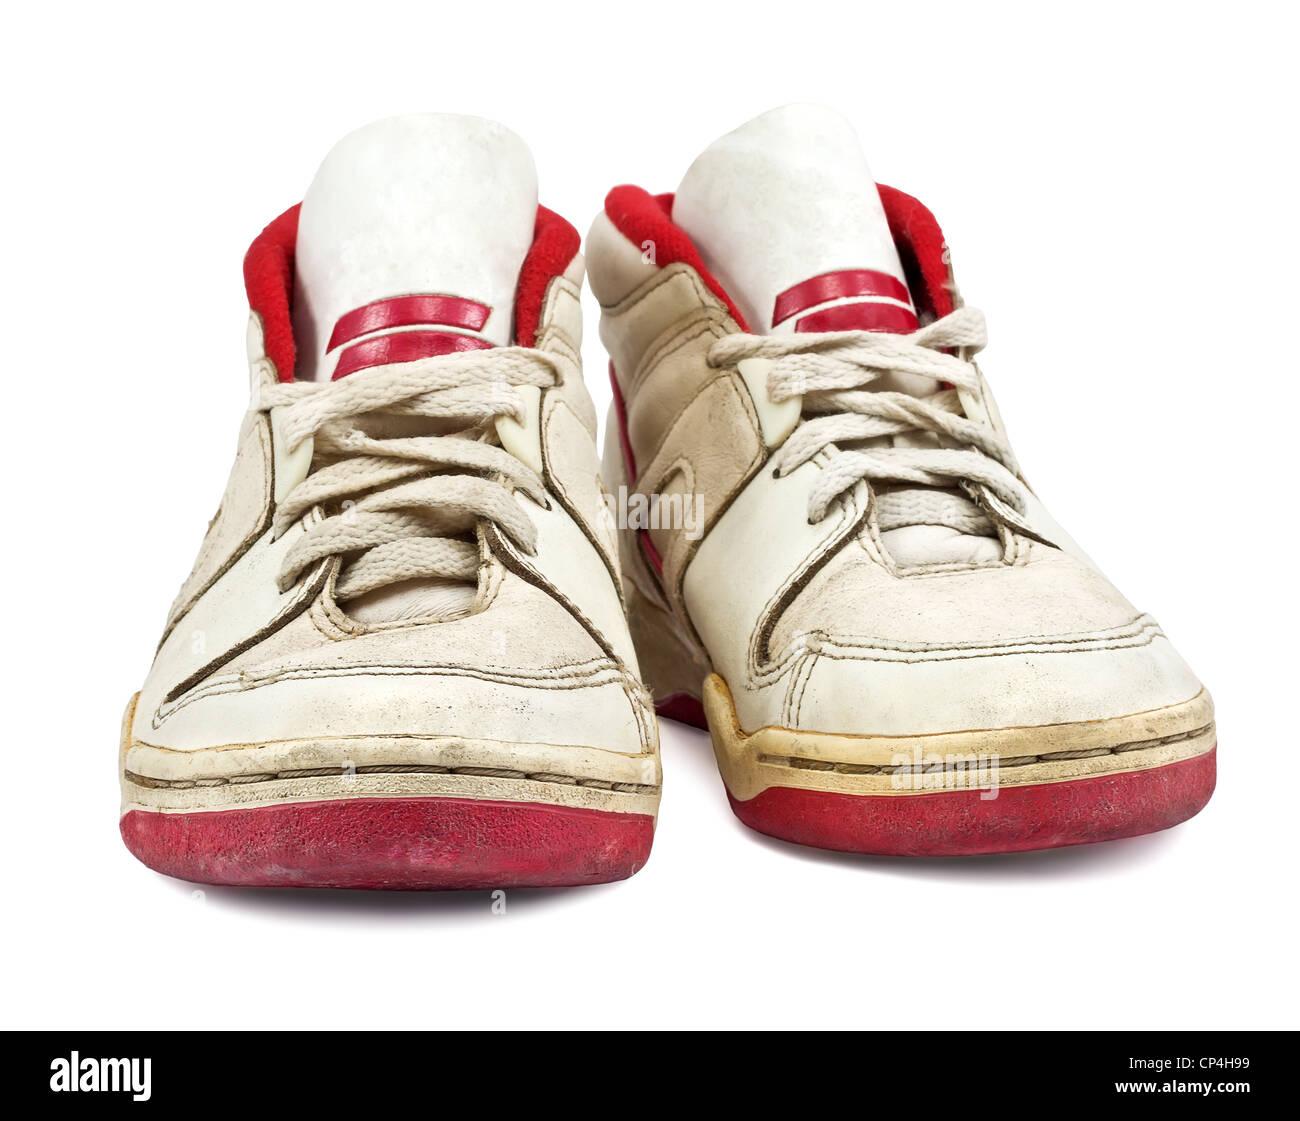 Recycles Shoe Laces